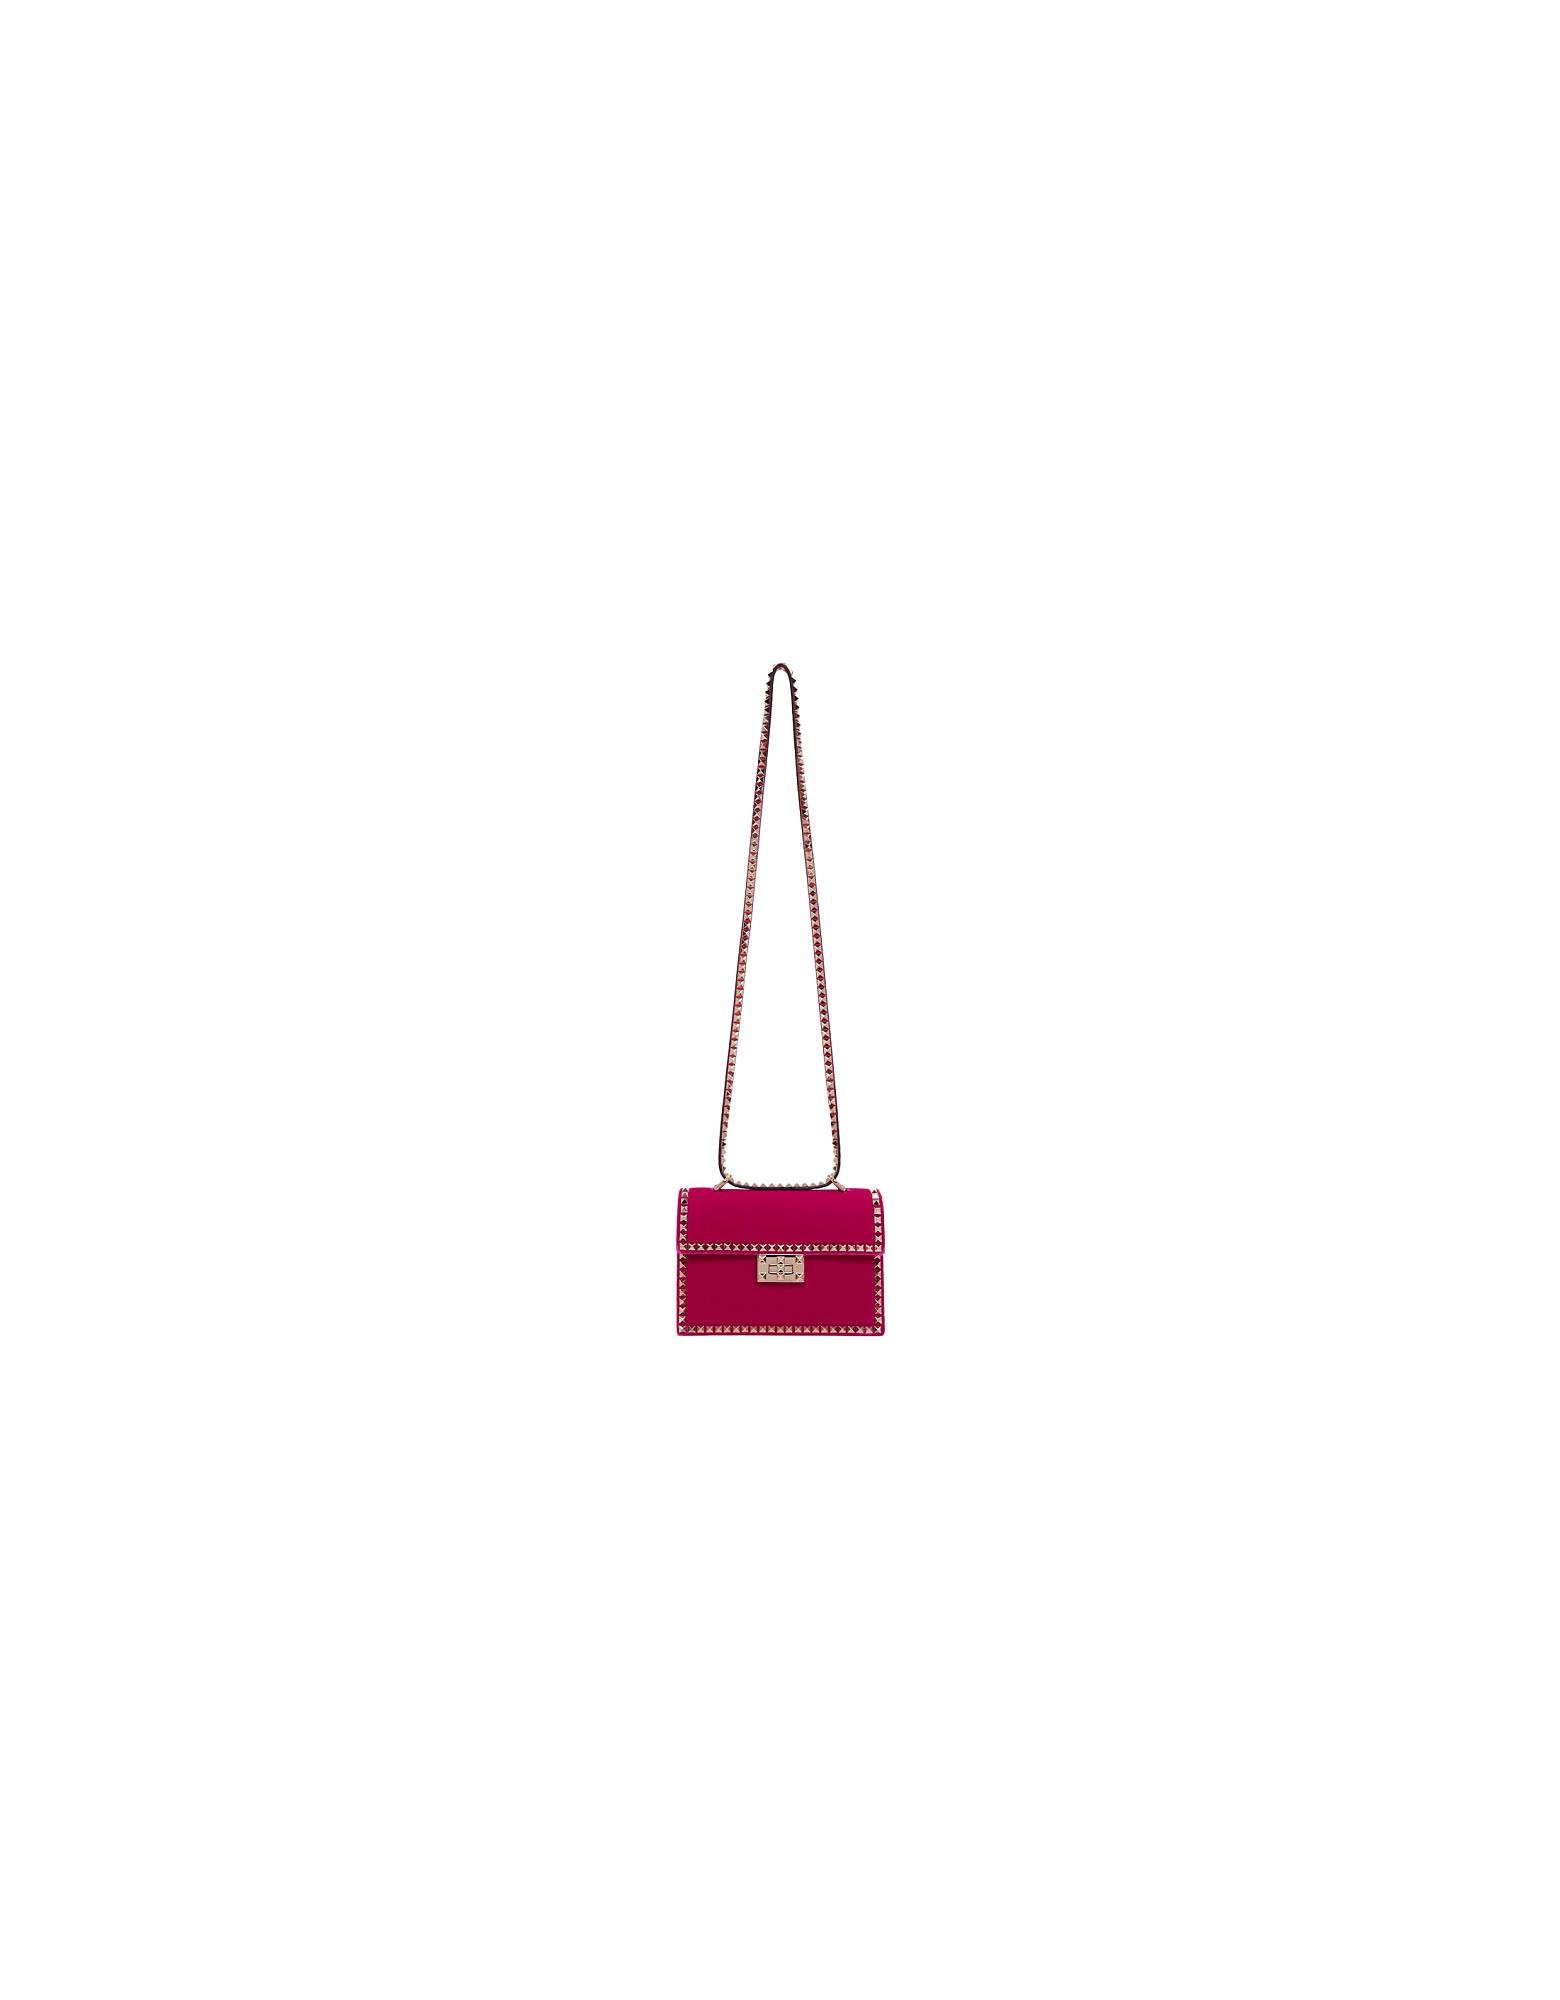 Valentino Designer Handbags, Pink Valentino Garavani No Limit Bag